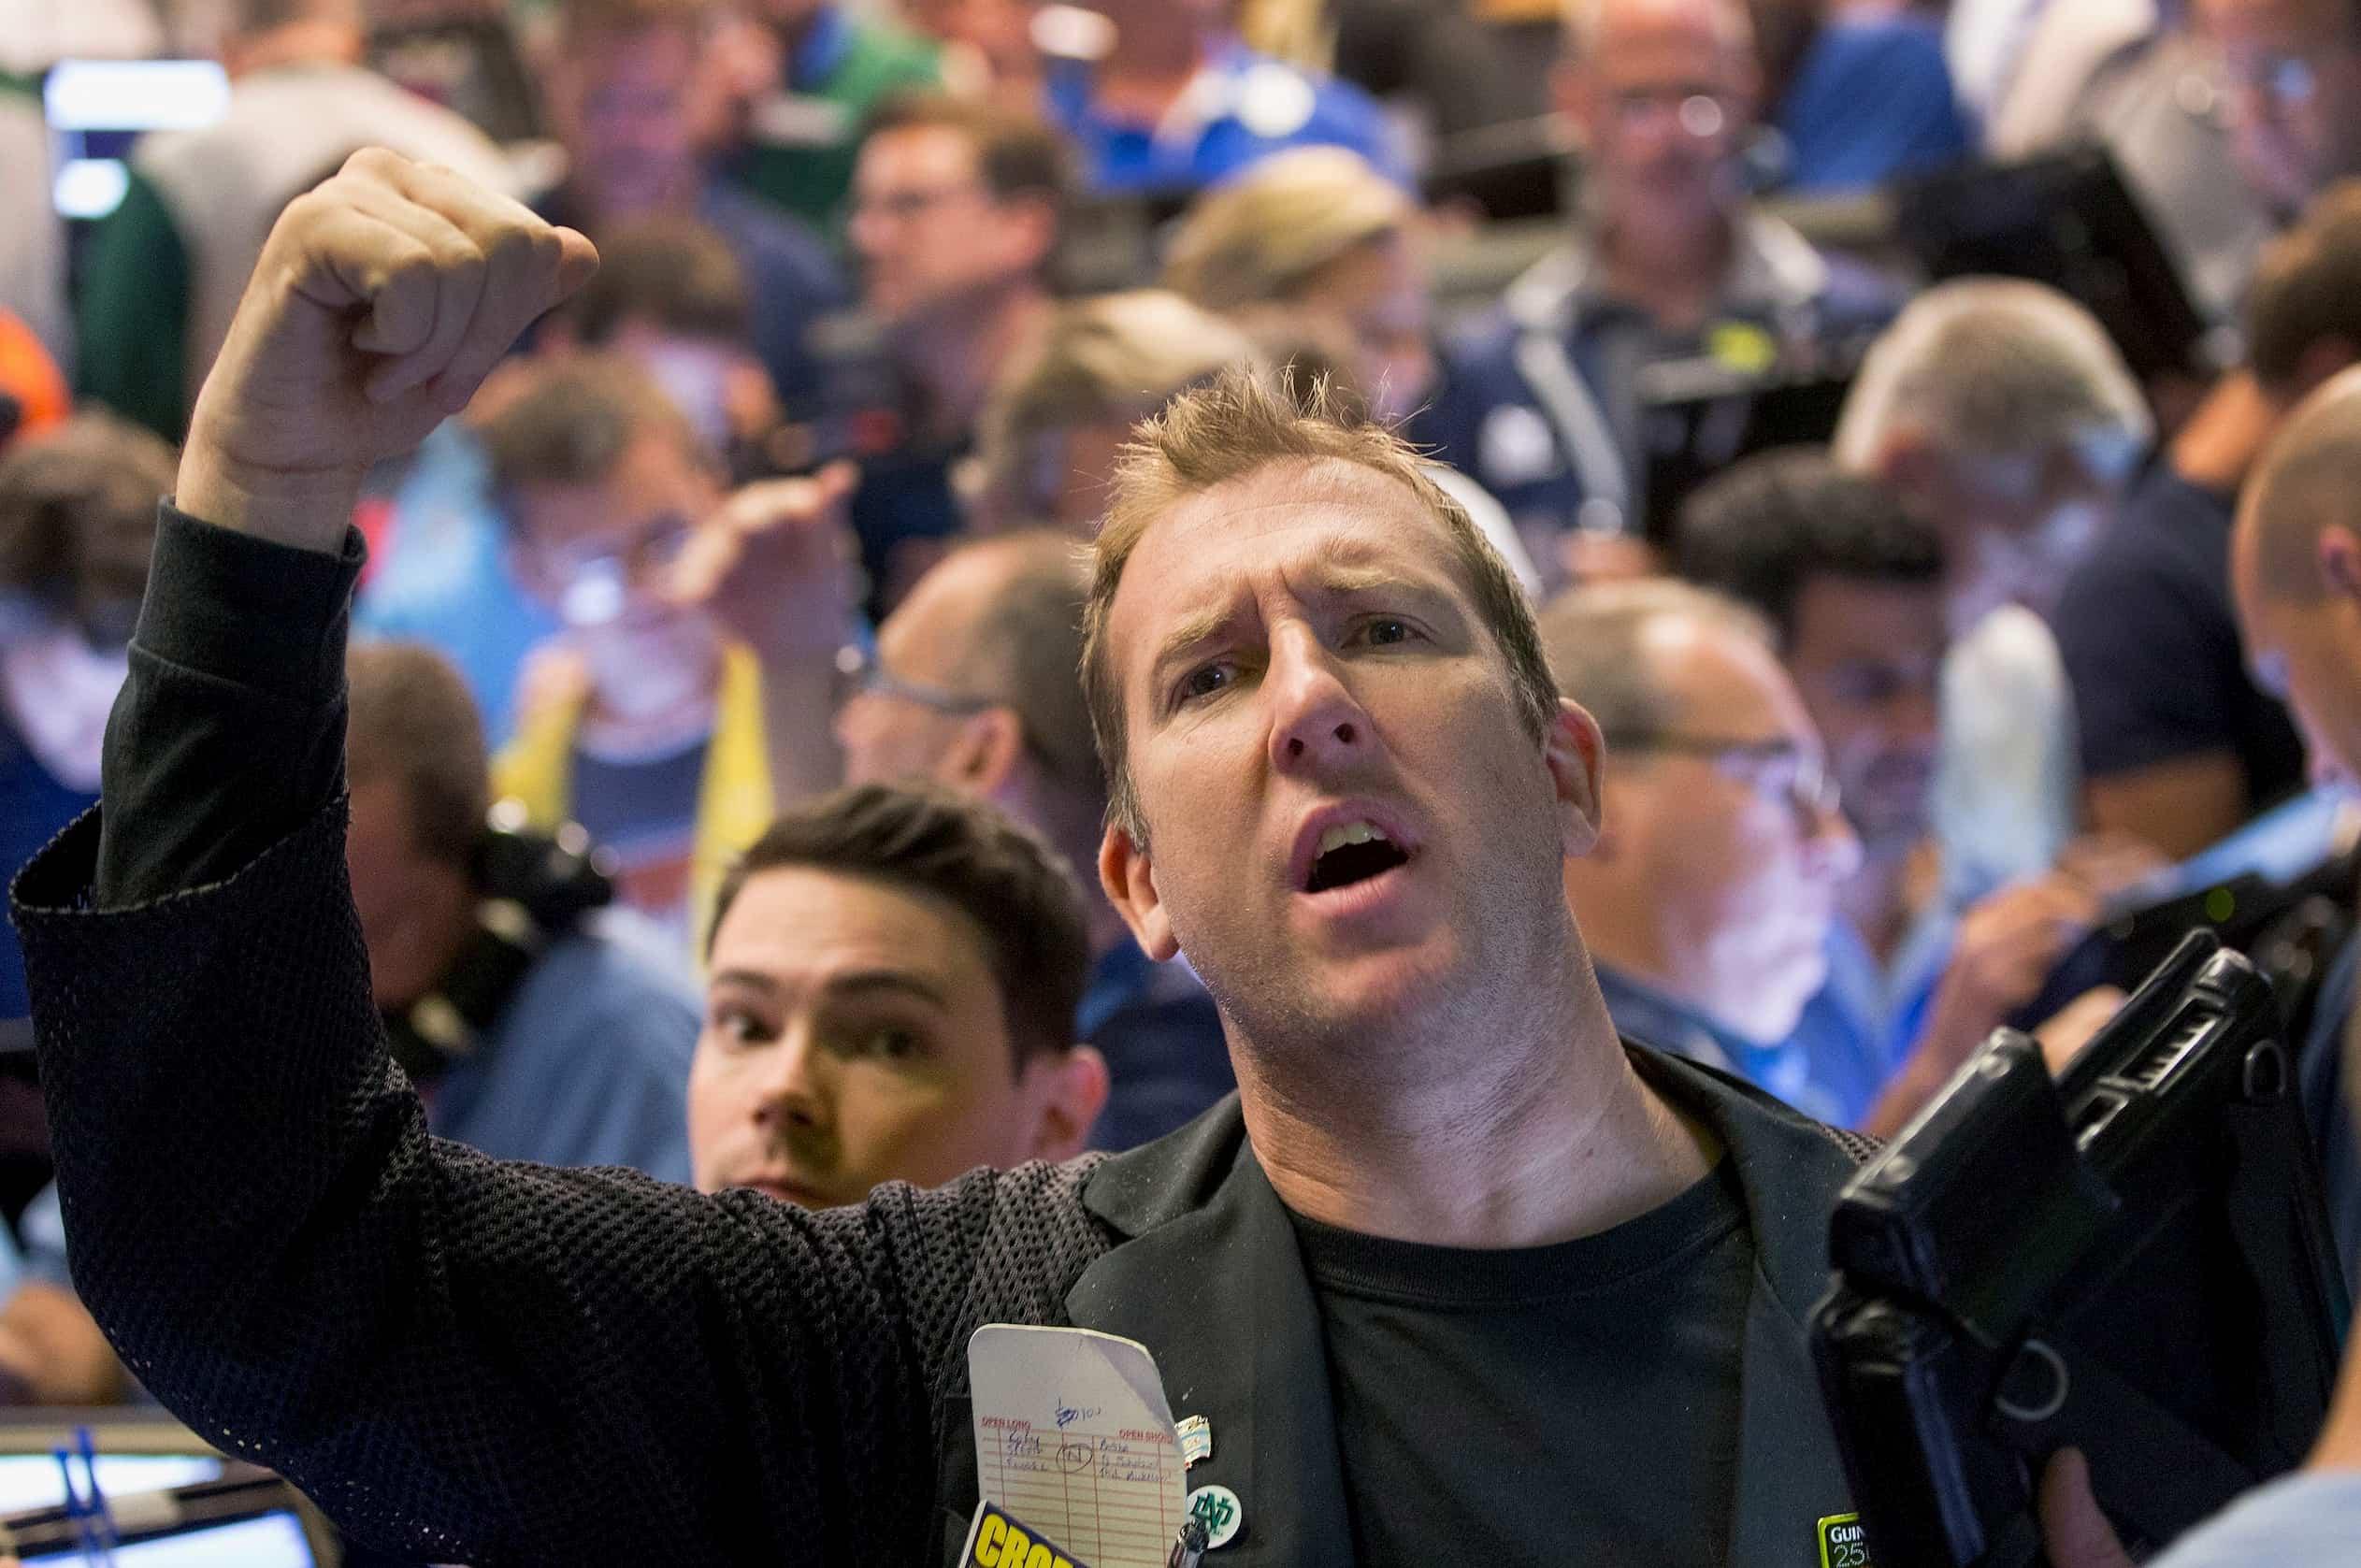 Investidor indignado